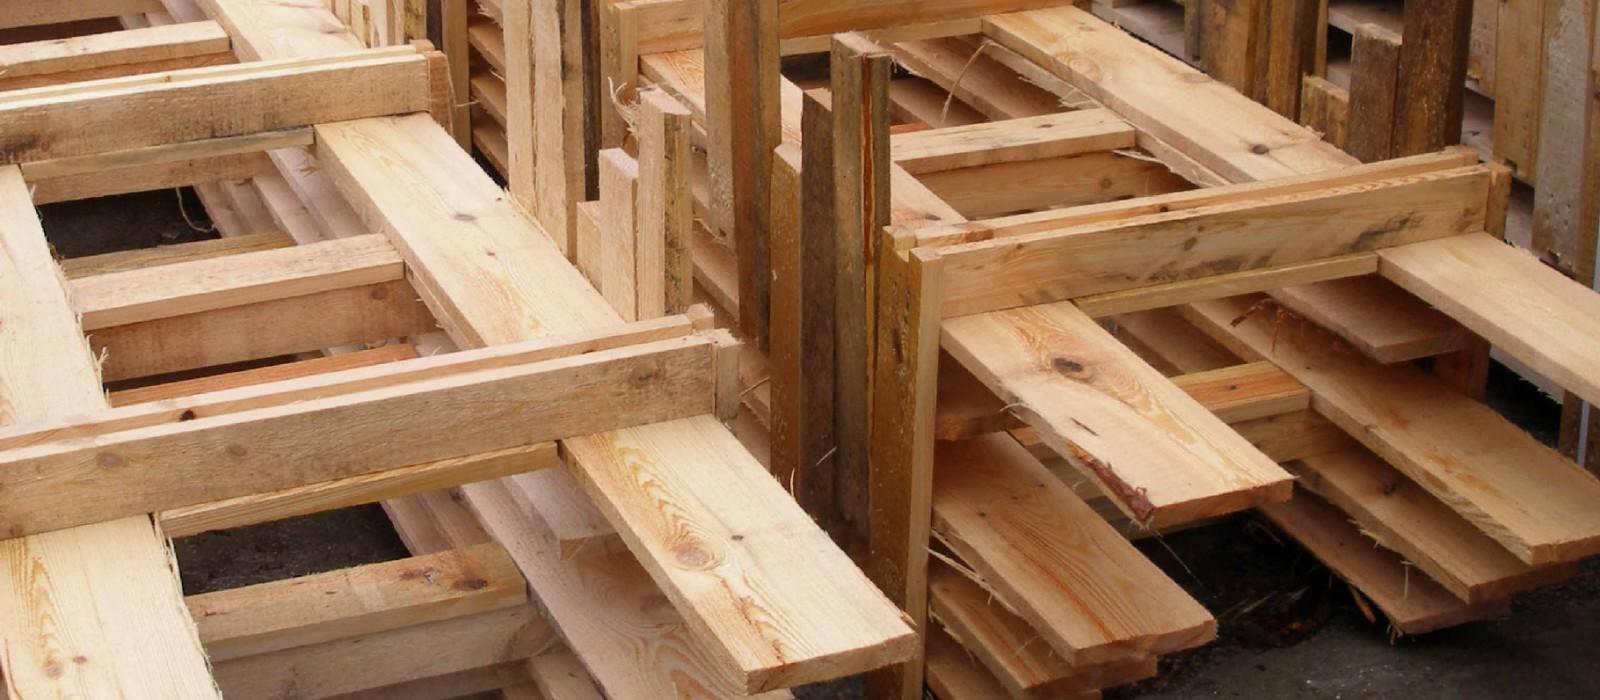 6-Langgutpalette-aus-Holz-6000x720x700